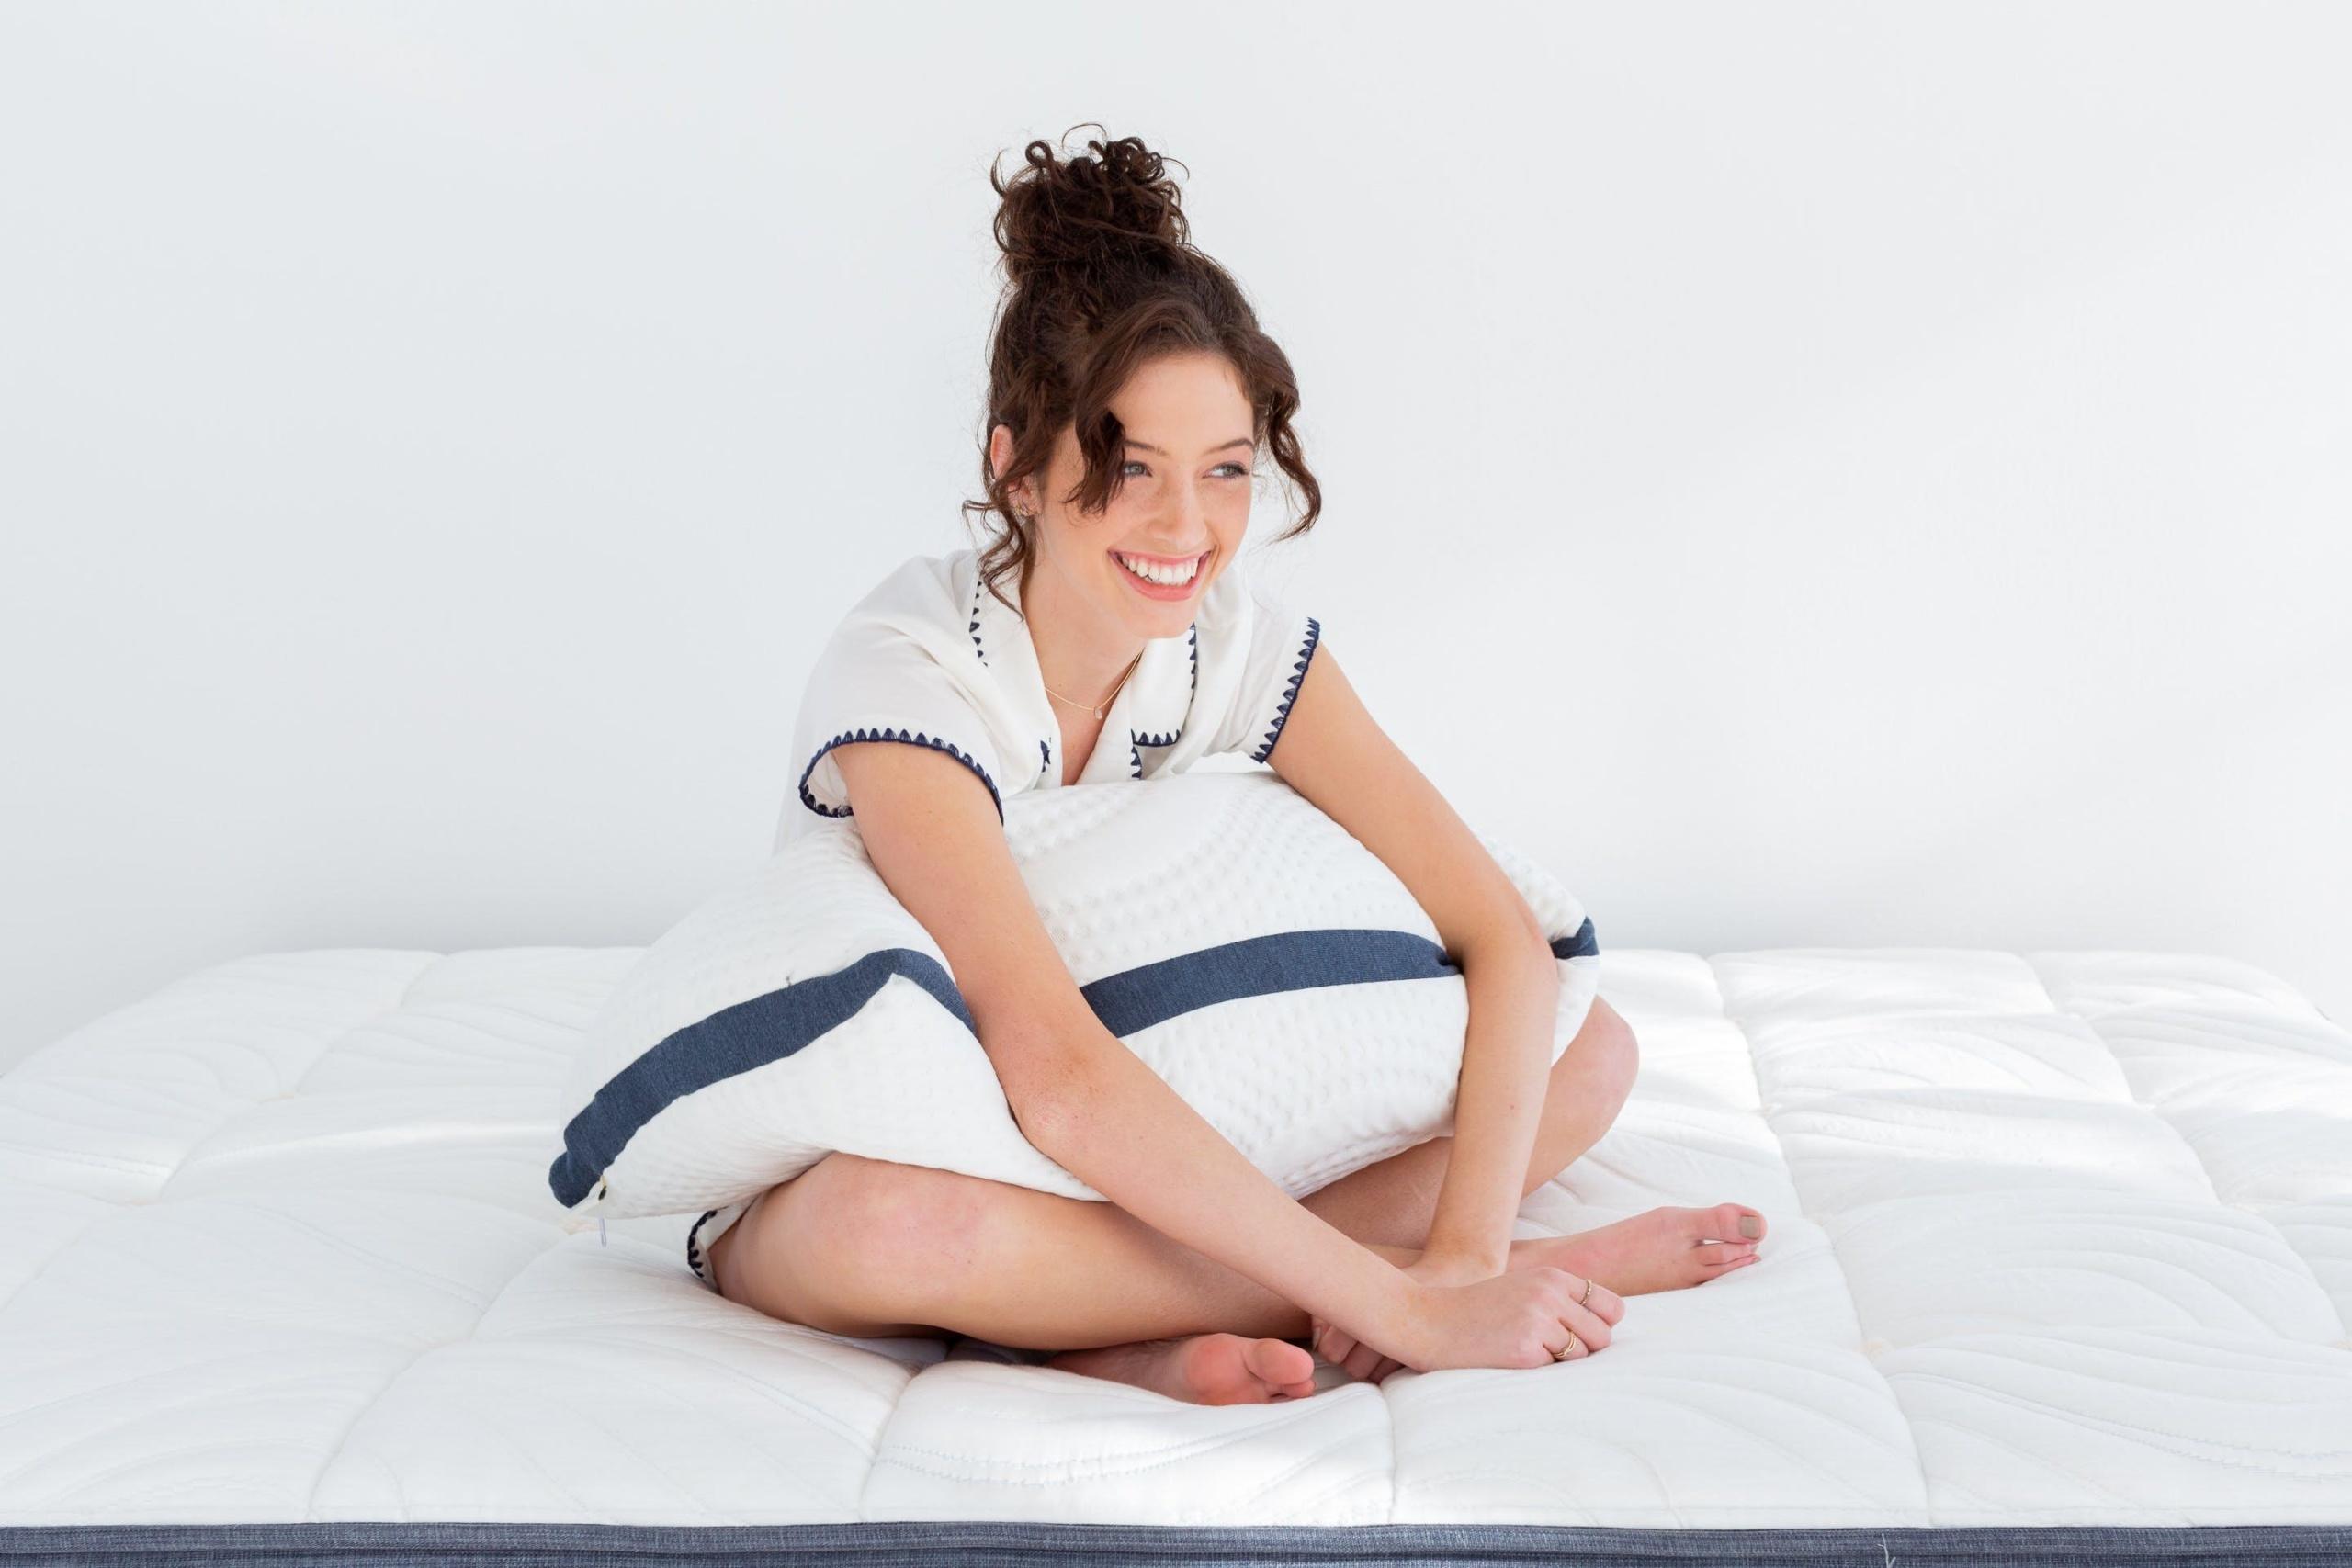 is the oceano mattress better than the dreamcloud?